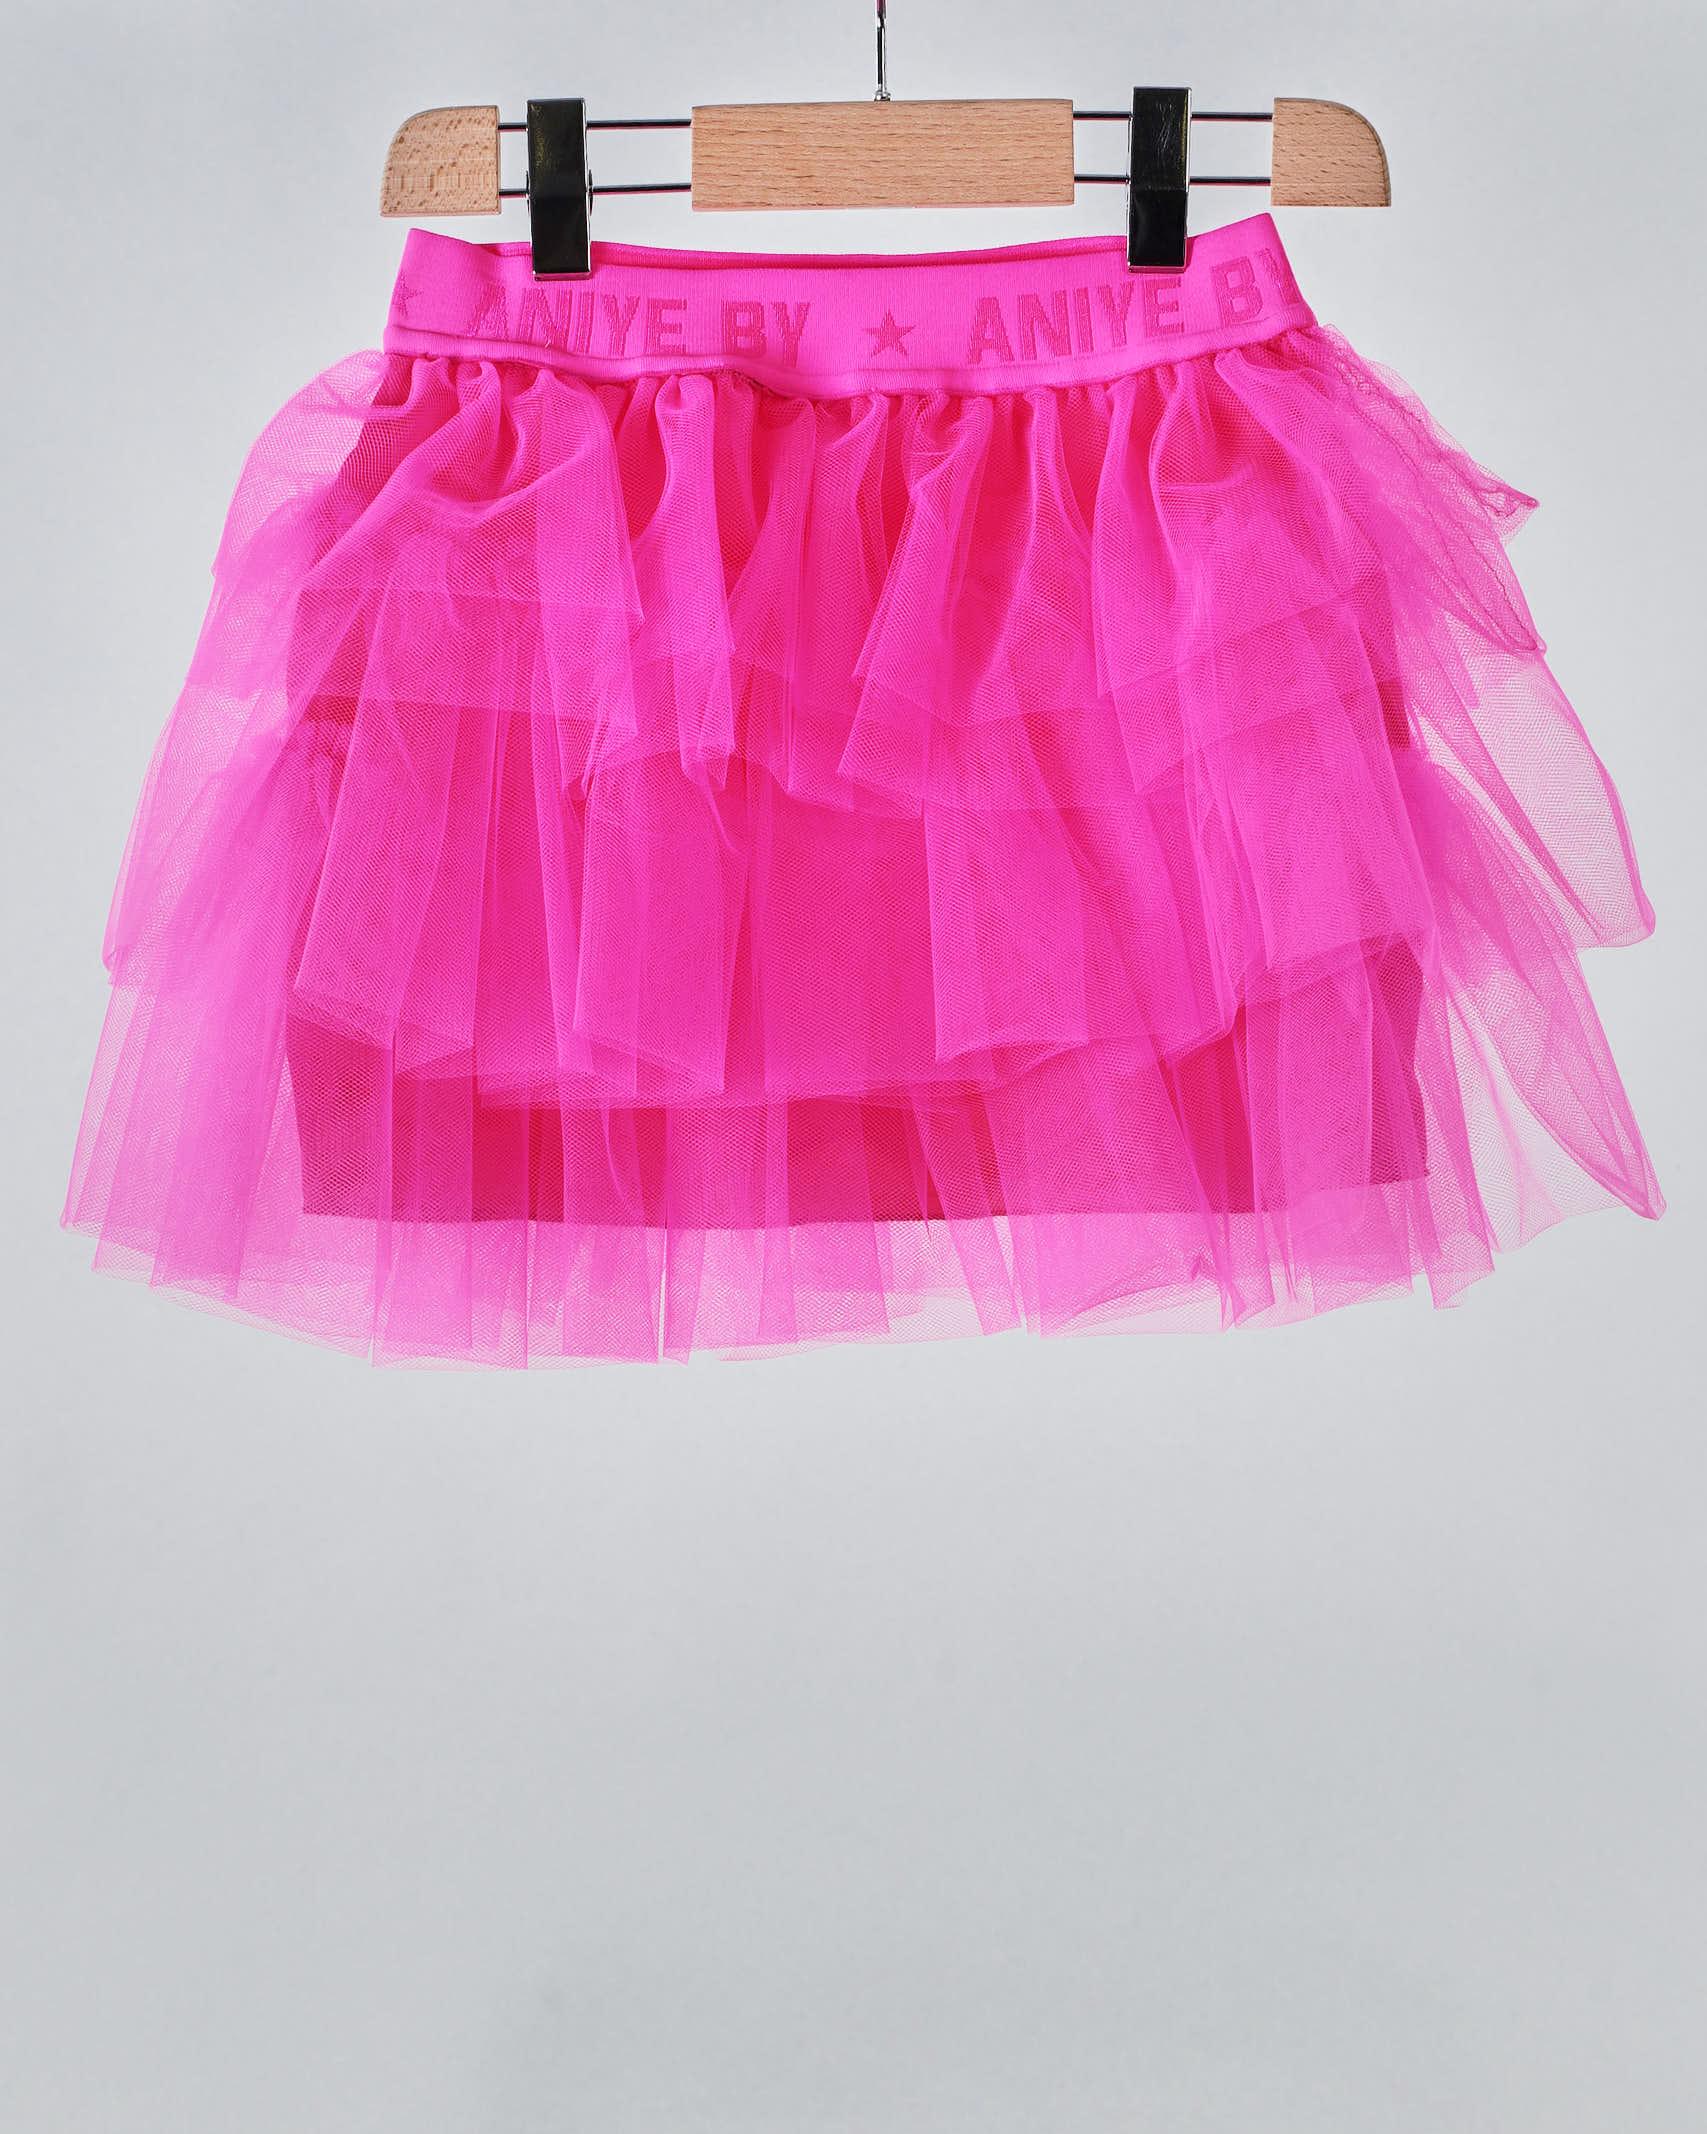 Gonna in tulle con elastico logato Aniye By Girl ANIYE BY GIRL | Gonna | 115014675